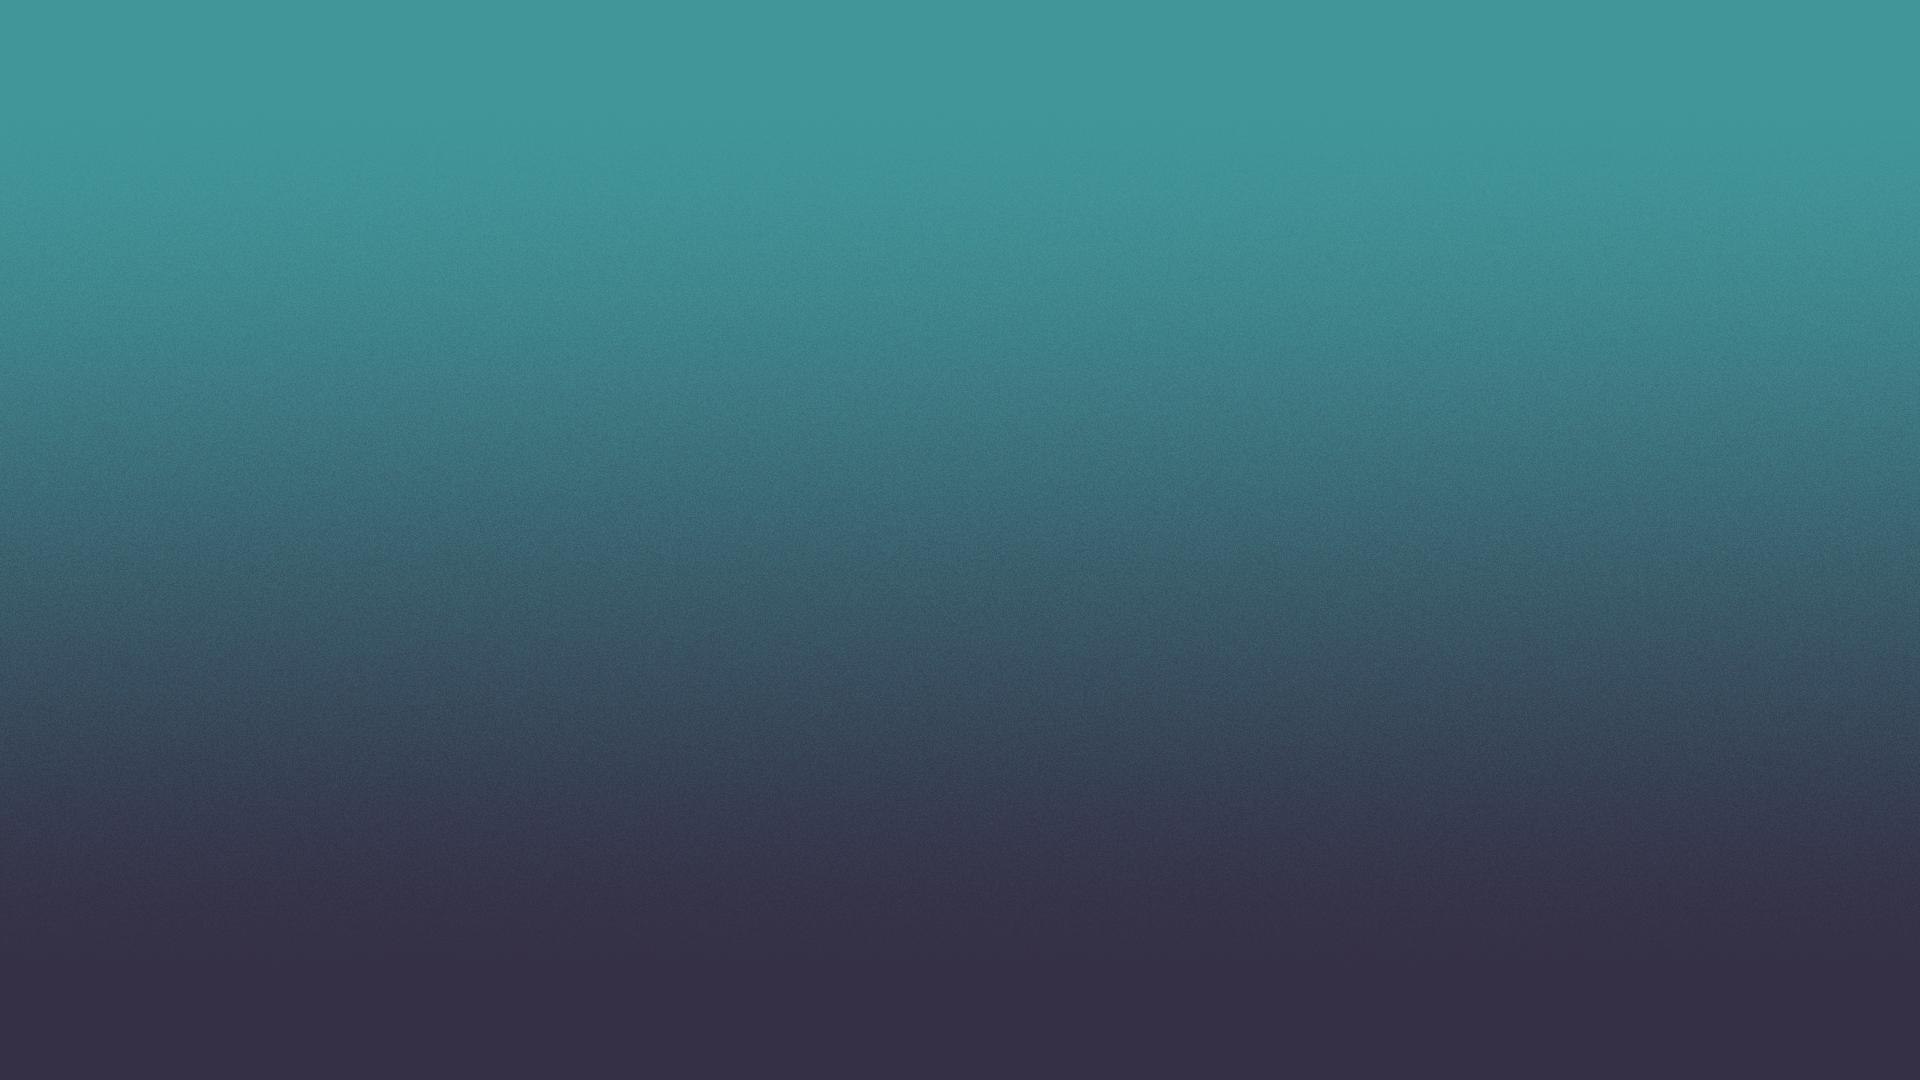 General 1920x1080 simple blue minimalism